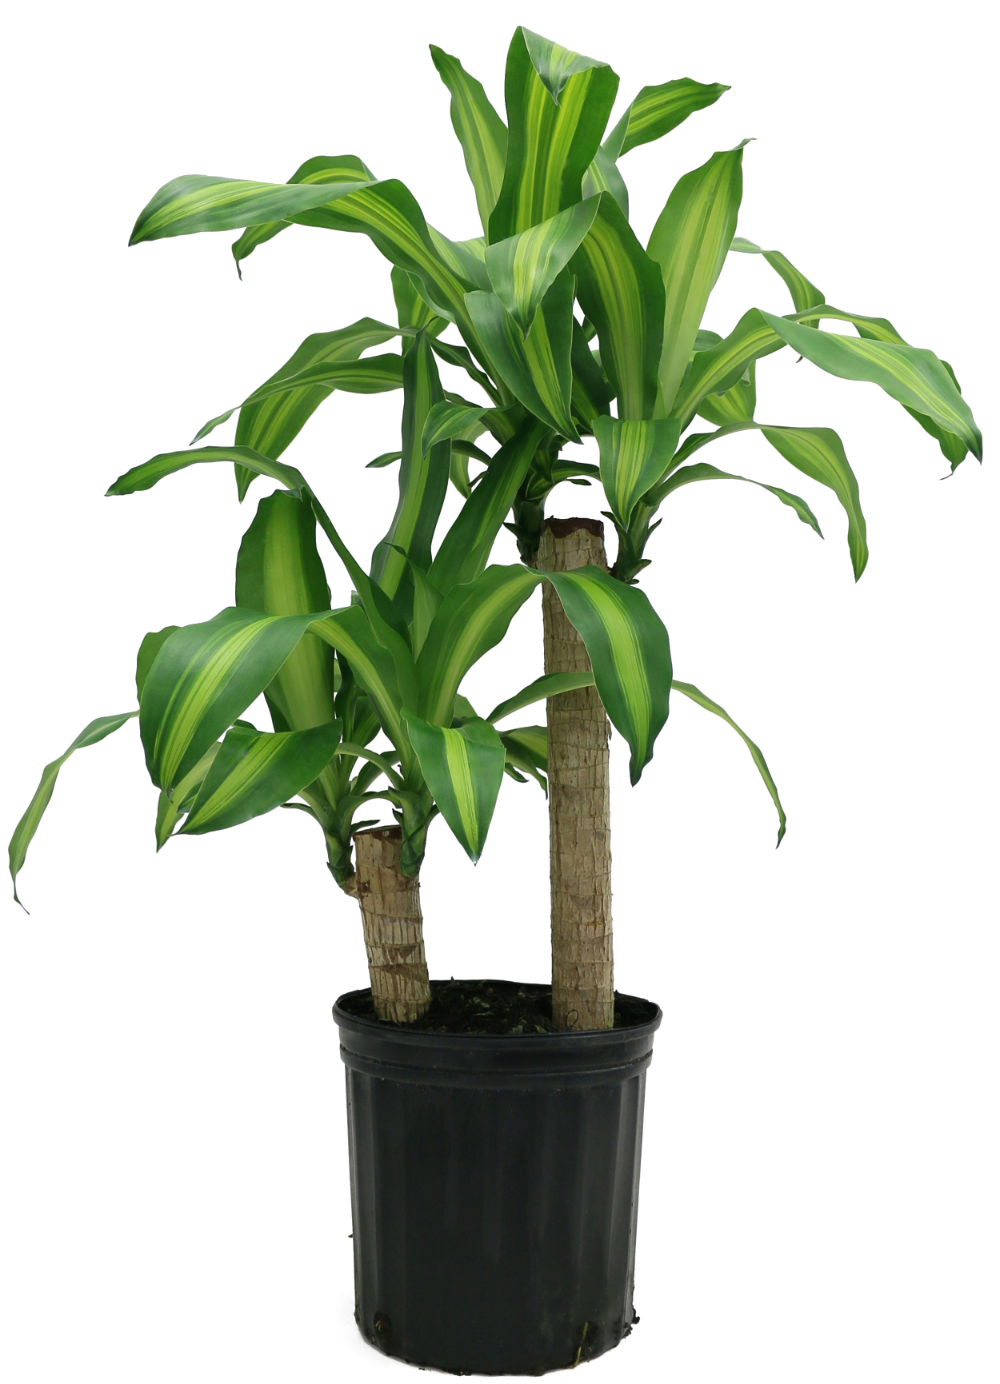 Patio & Garden in 2020 Corn plant, Live house plants